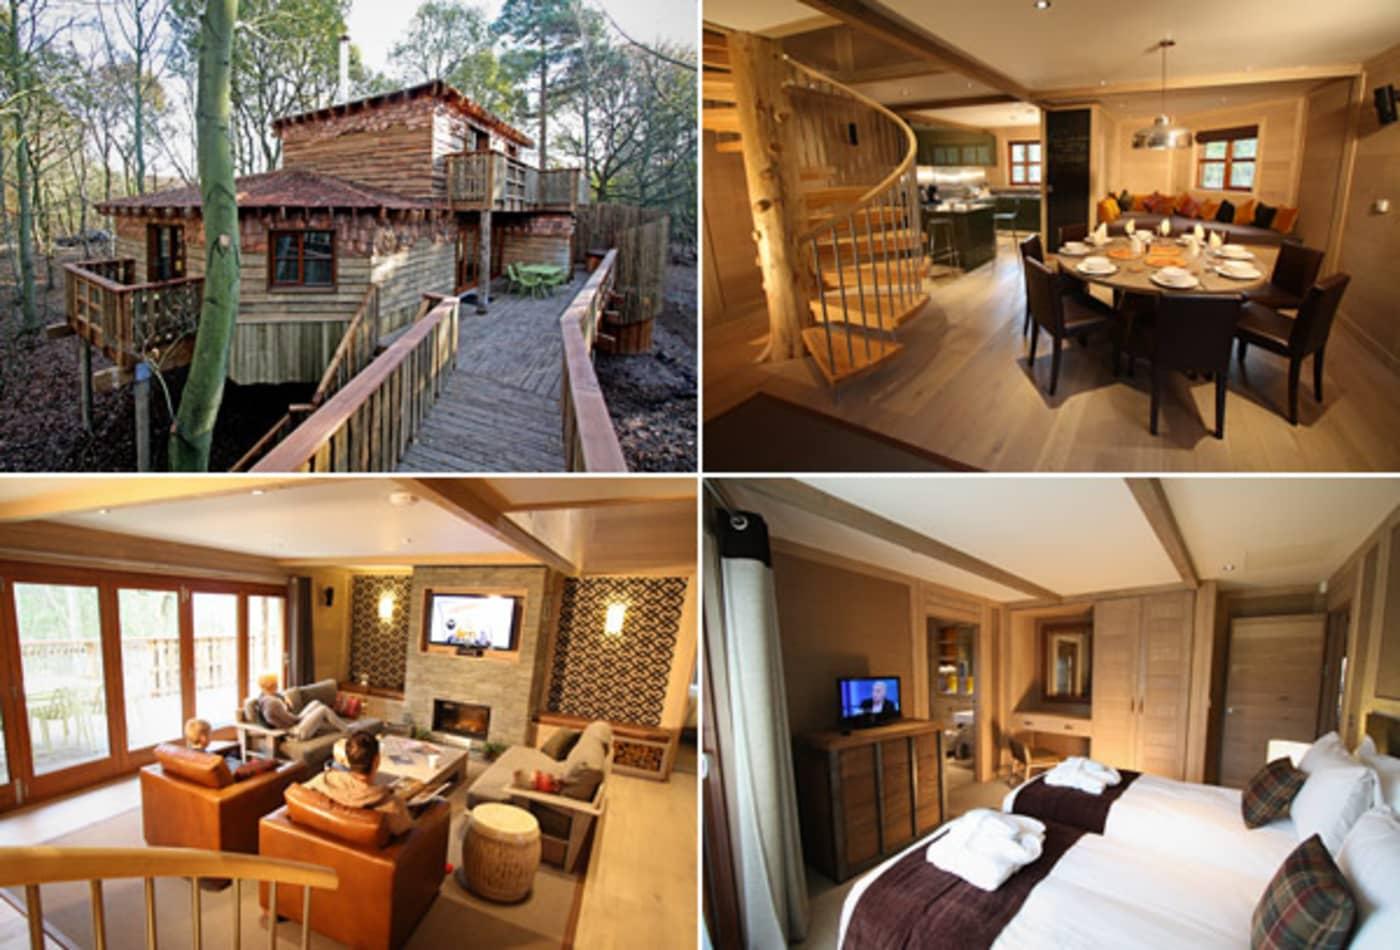 Treehouse_Homes_Center_Parcs.jpg